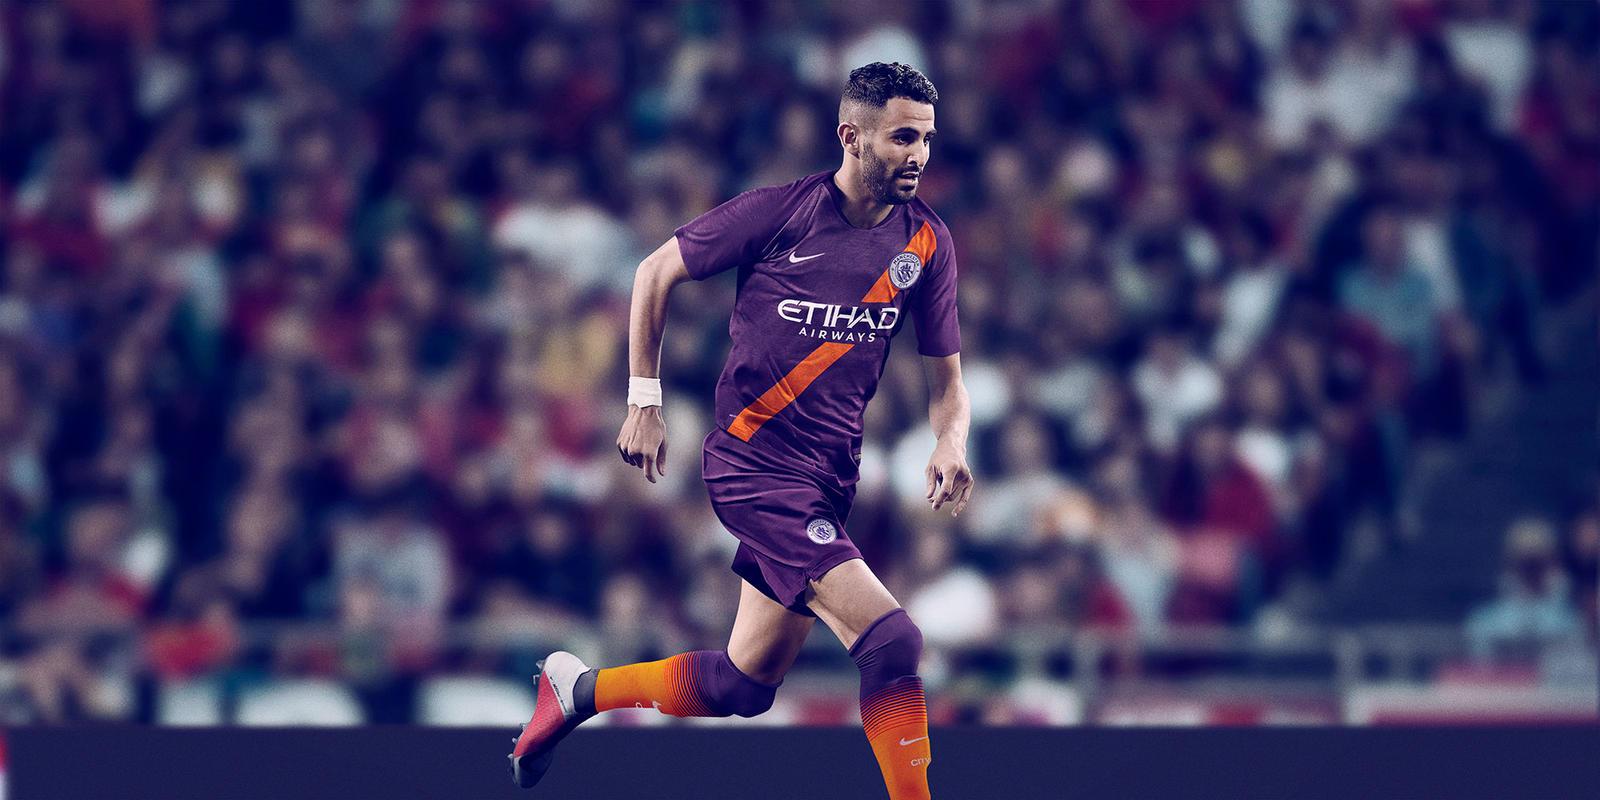 Manchester City 2018 19 Nike Third Kit. By. Football Fashion Staff e069415ba7b